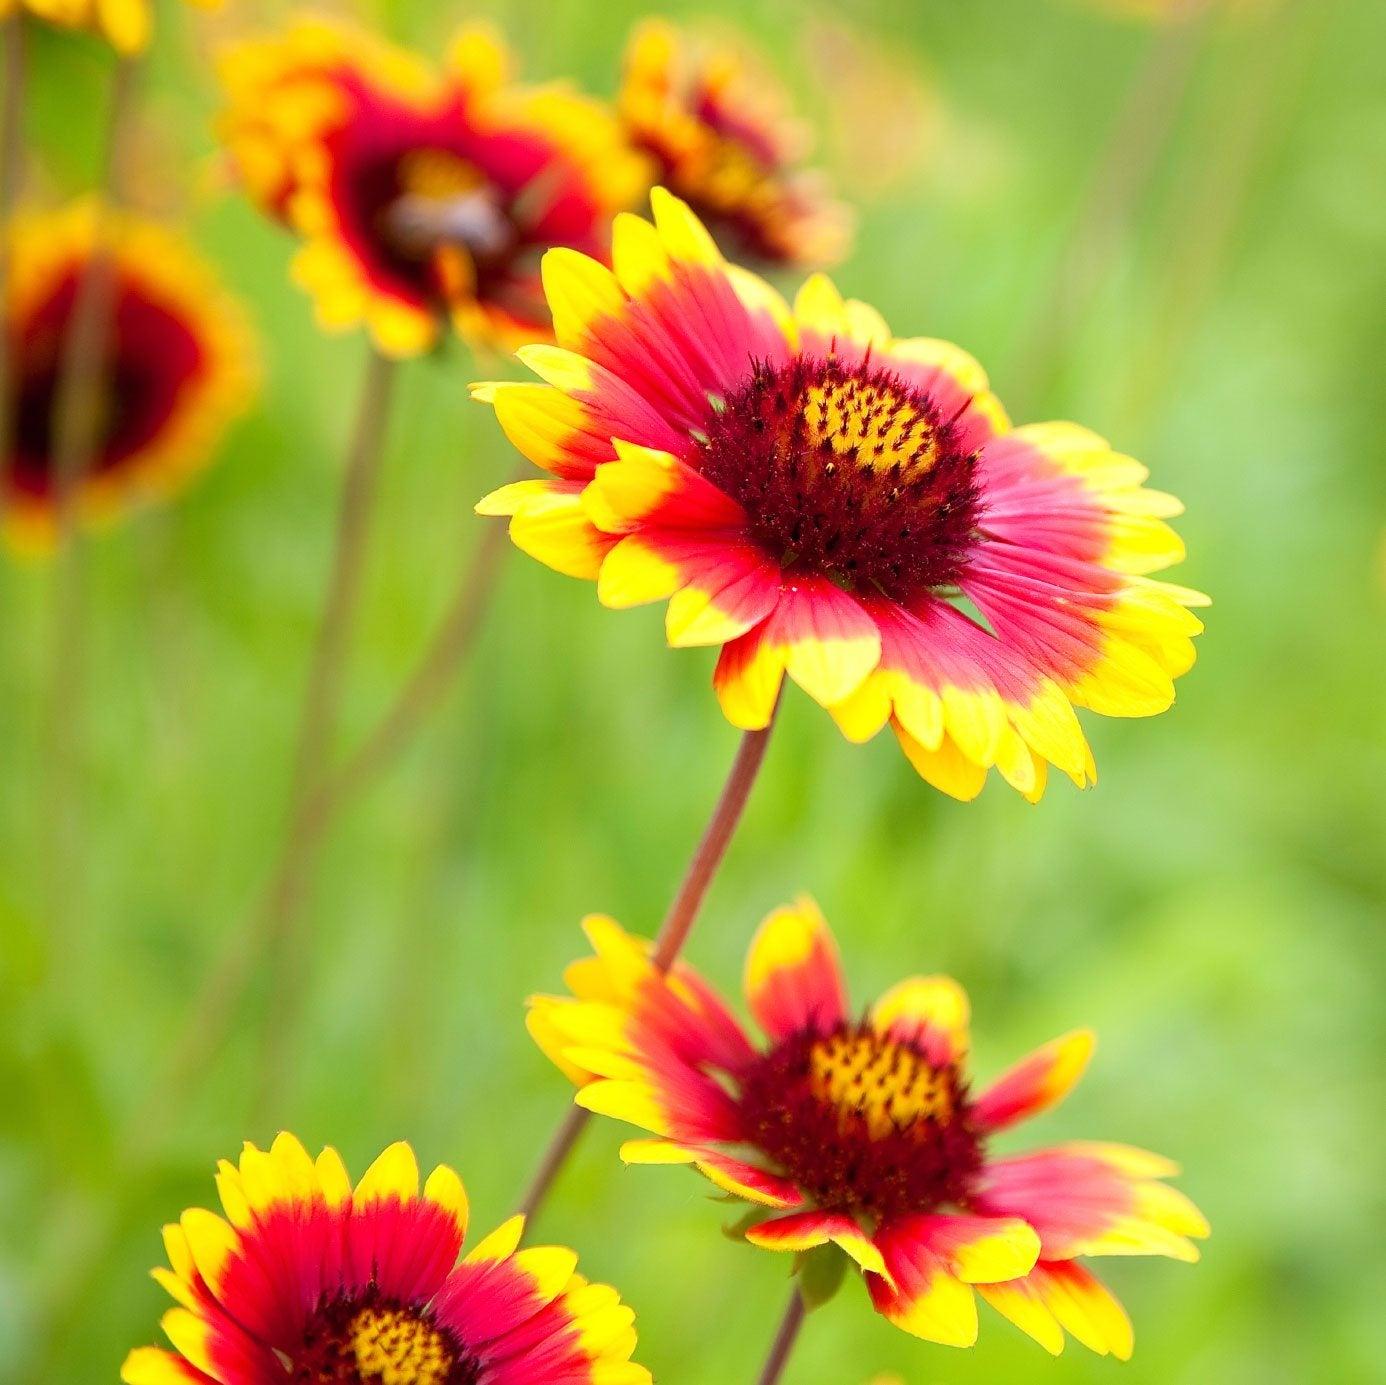 Blanket Flower Winter Care – How To Winterize Blanket Flower Plants